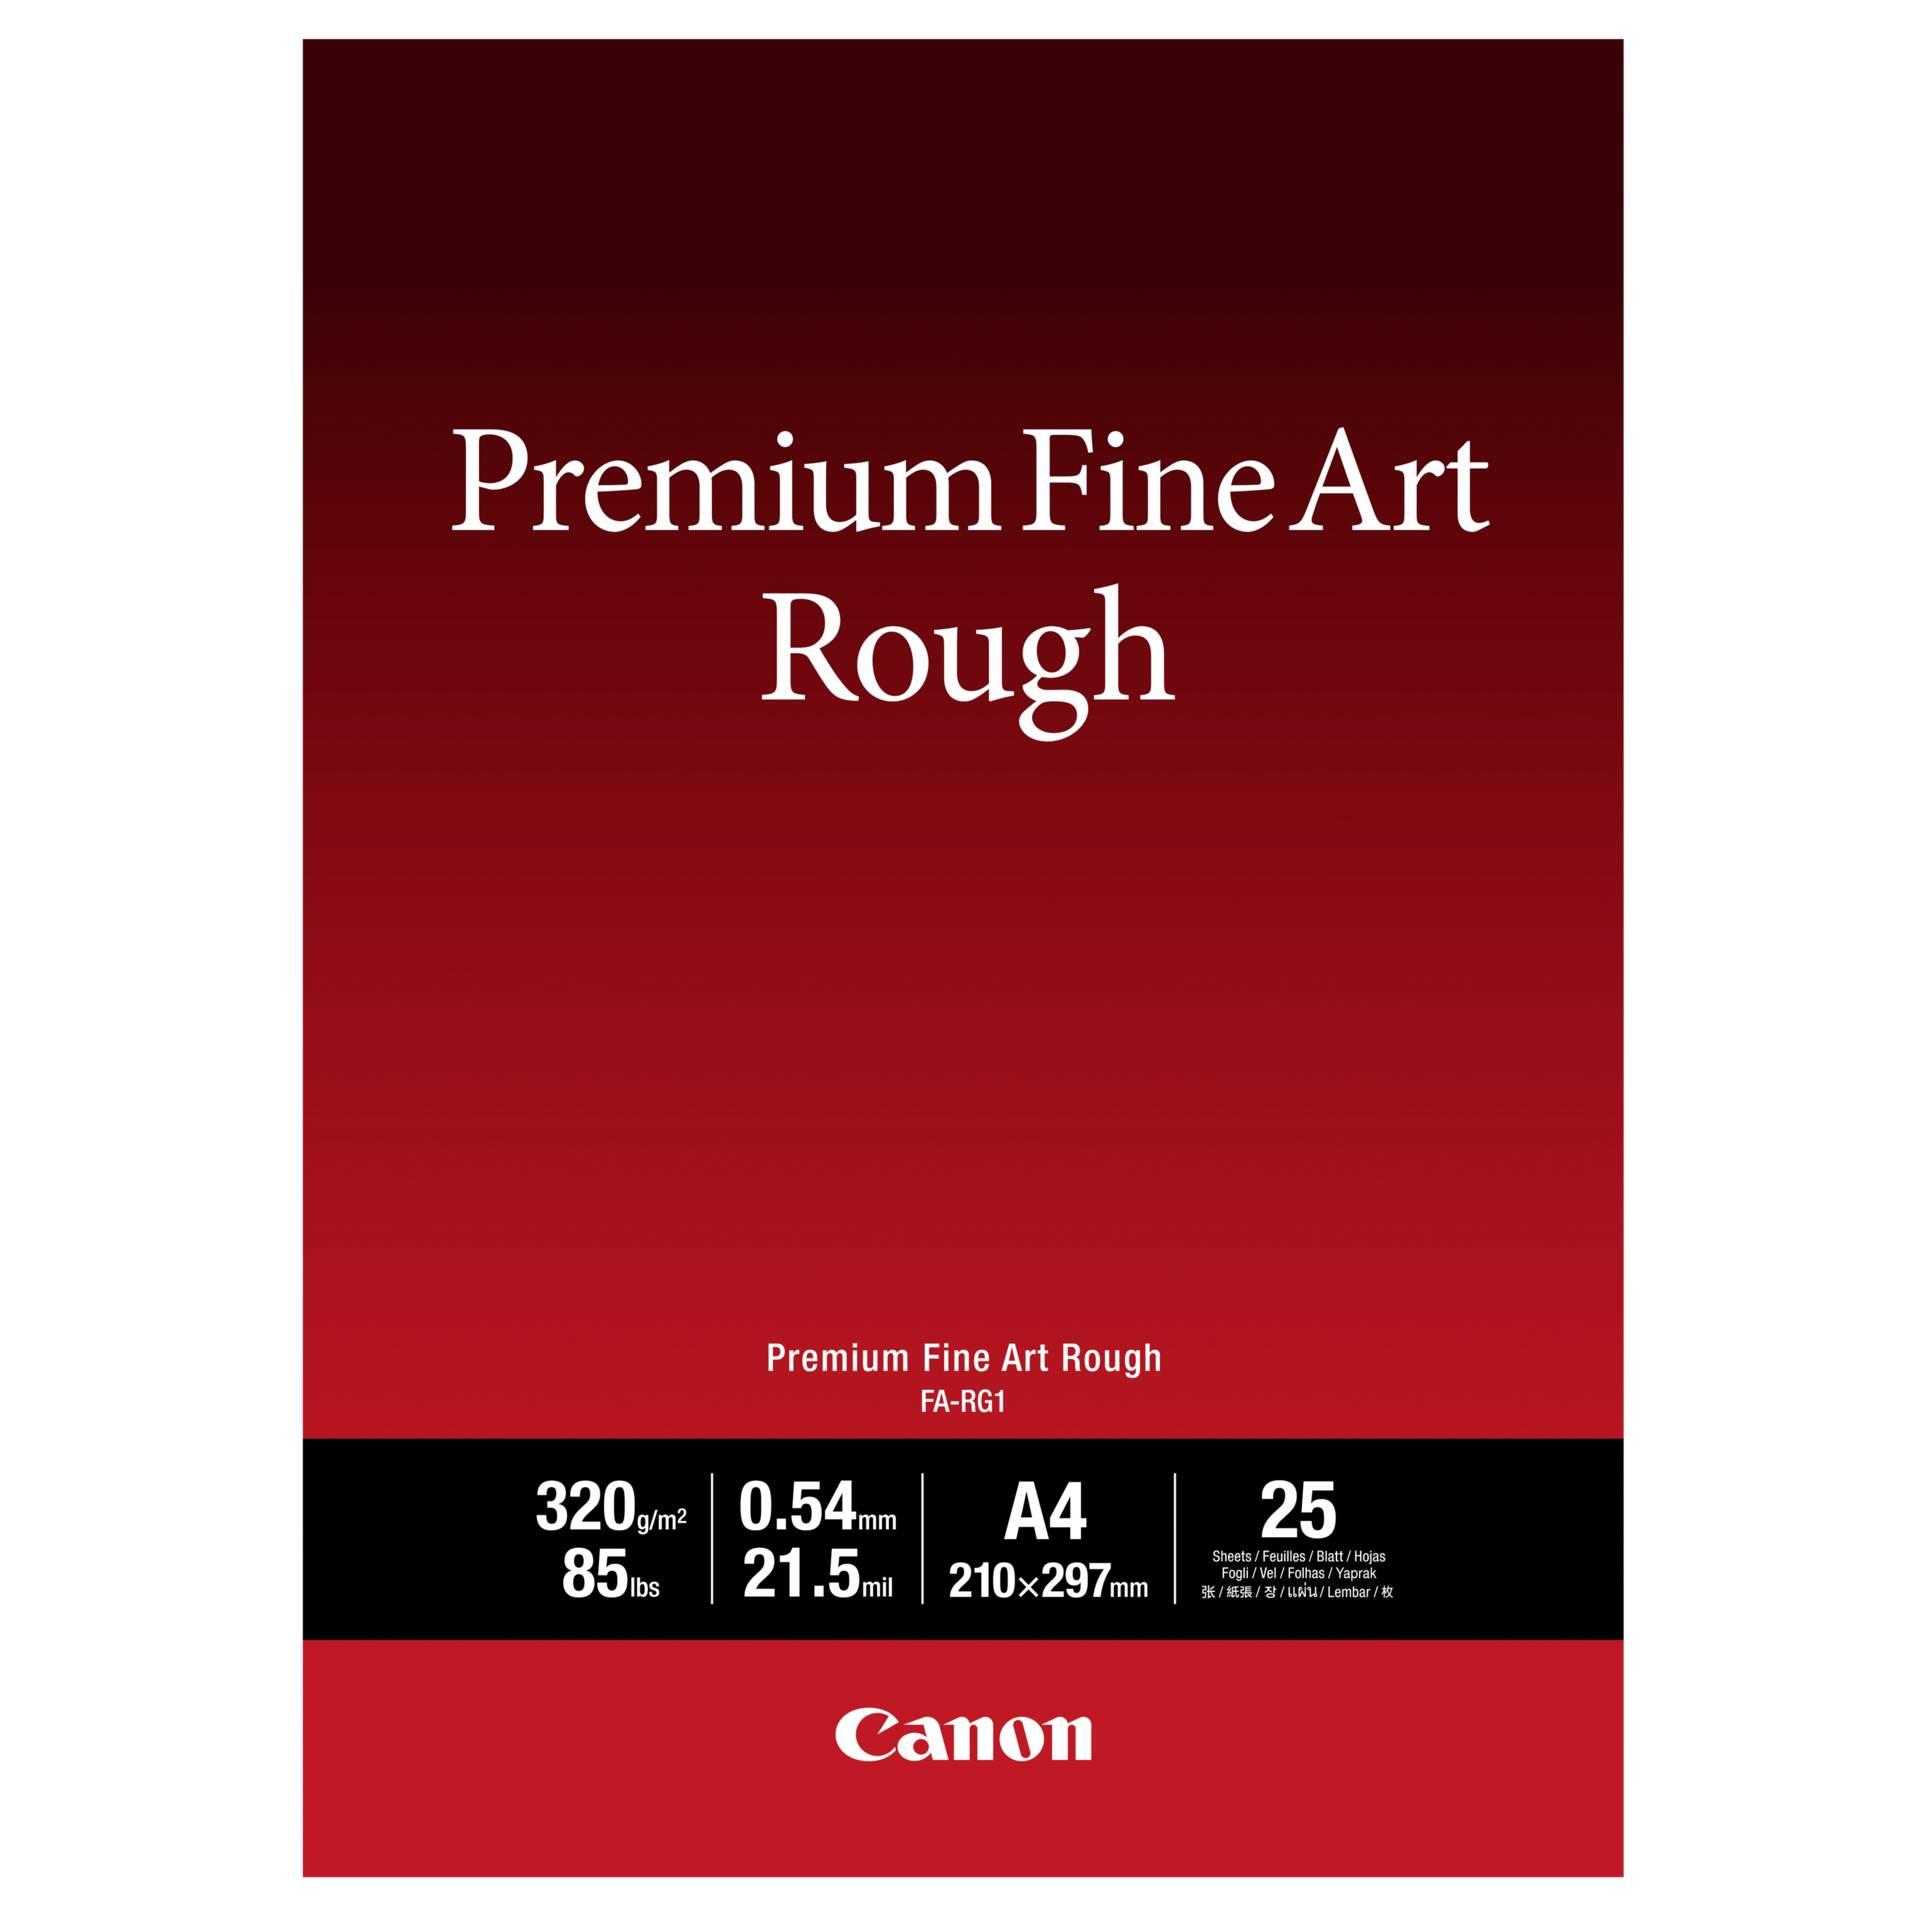 Canon FA-RG1 Premium Fine Art Rough A4 320g (25 sheets)